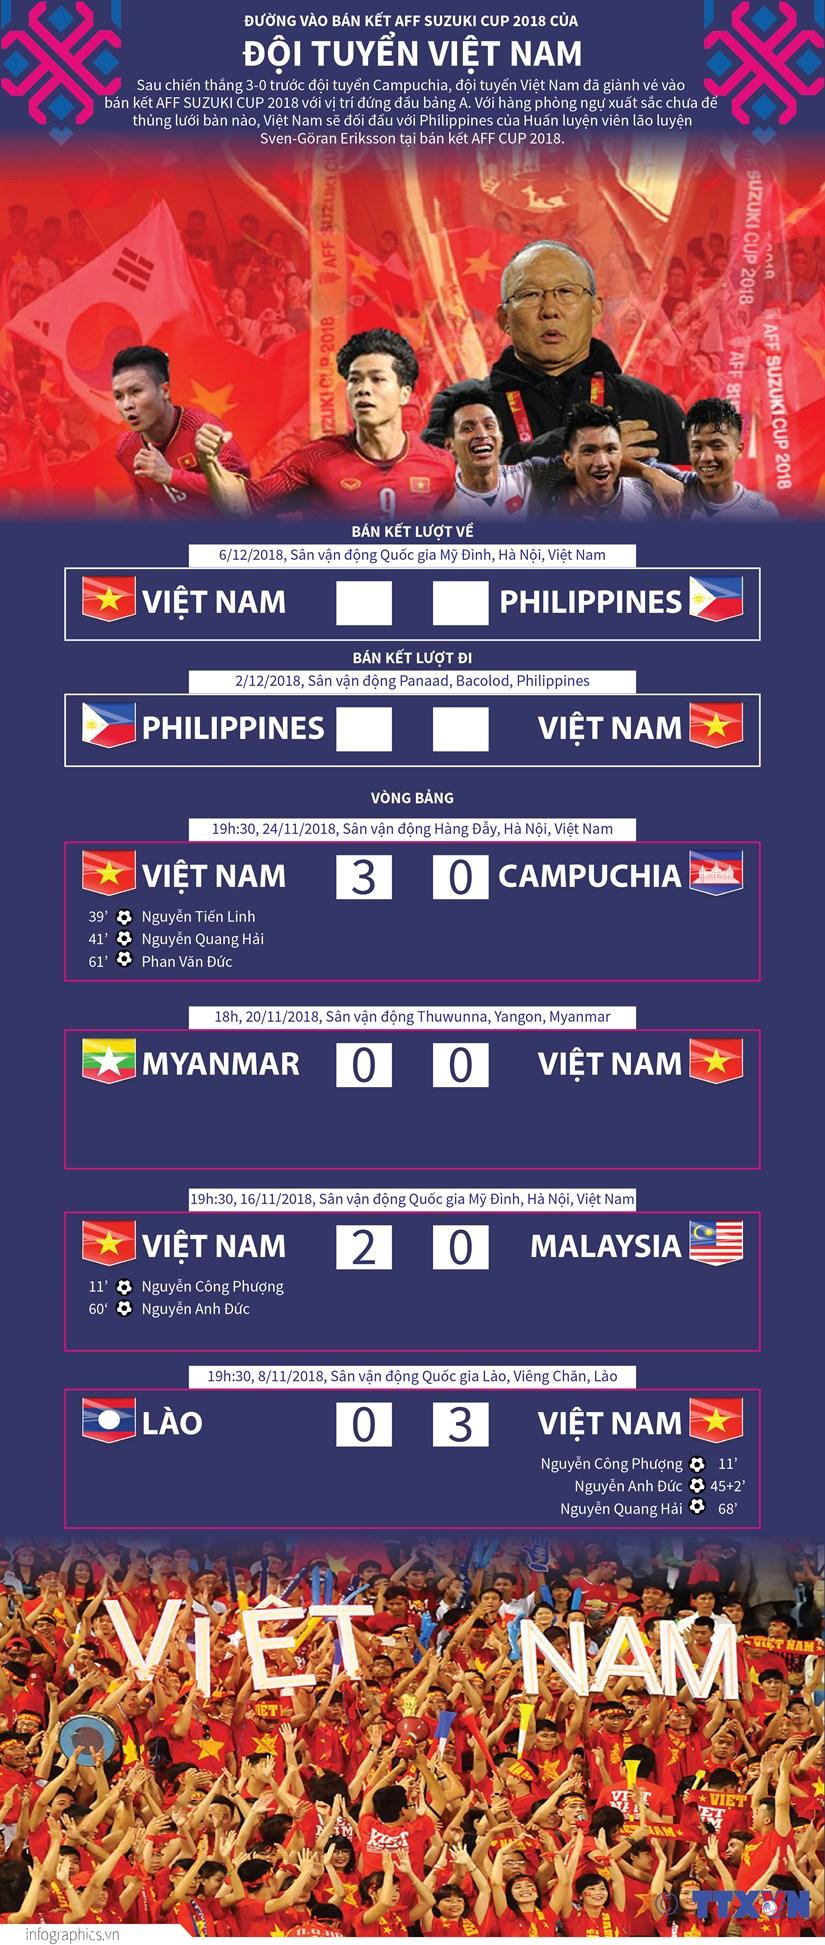 Duong vao ban ket AFF Suzuki Cup 2018 cua doi tuyen Viet Nam hinh anh 1